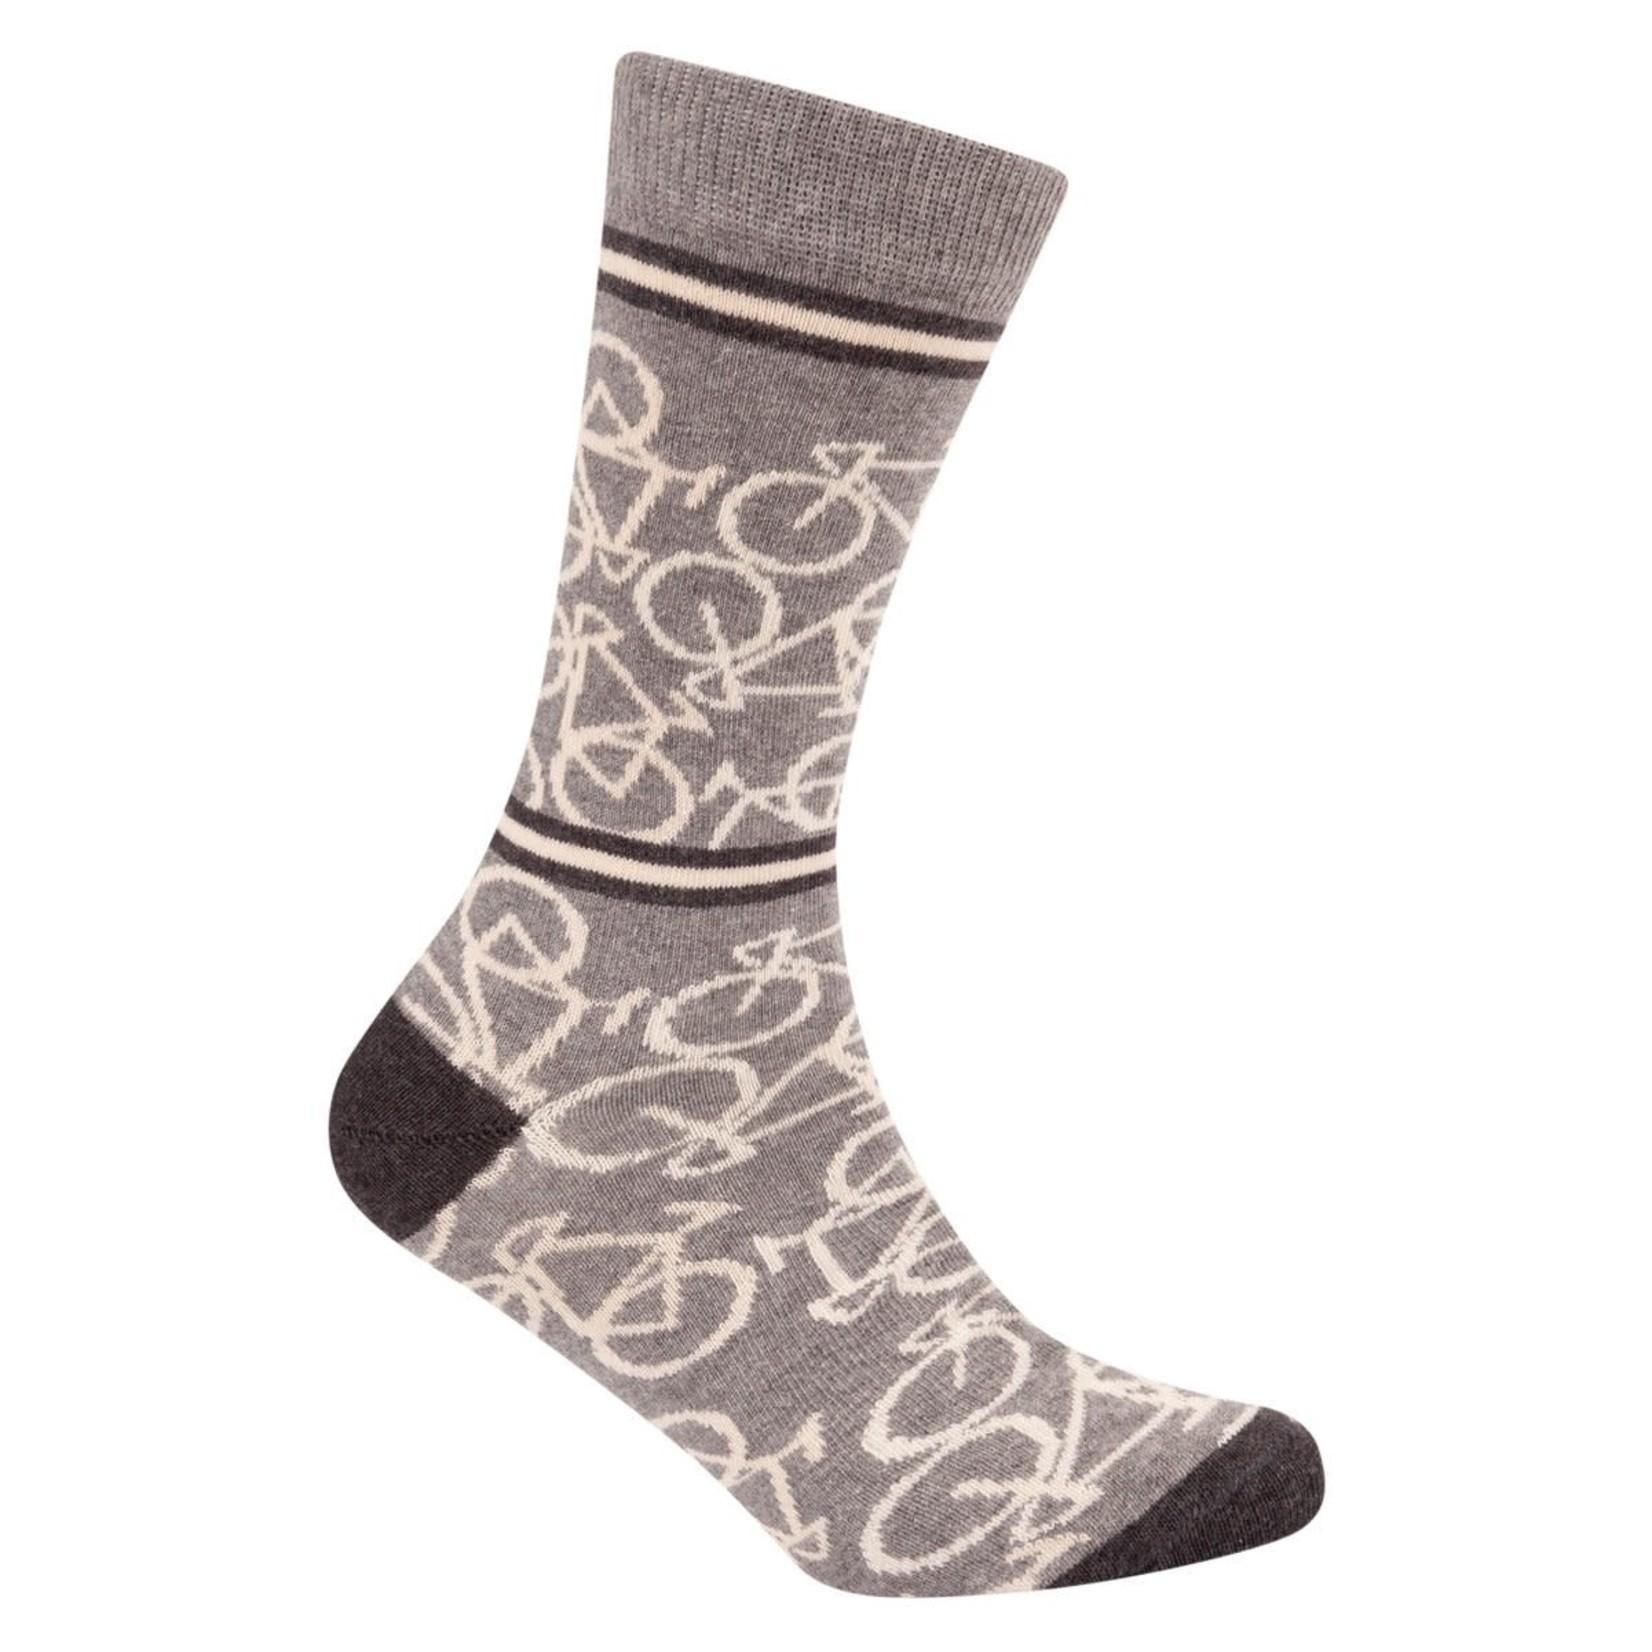 Sokken 'Le Patron' Bicycle socks mid grey